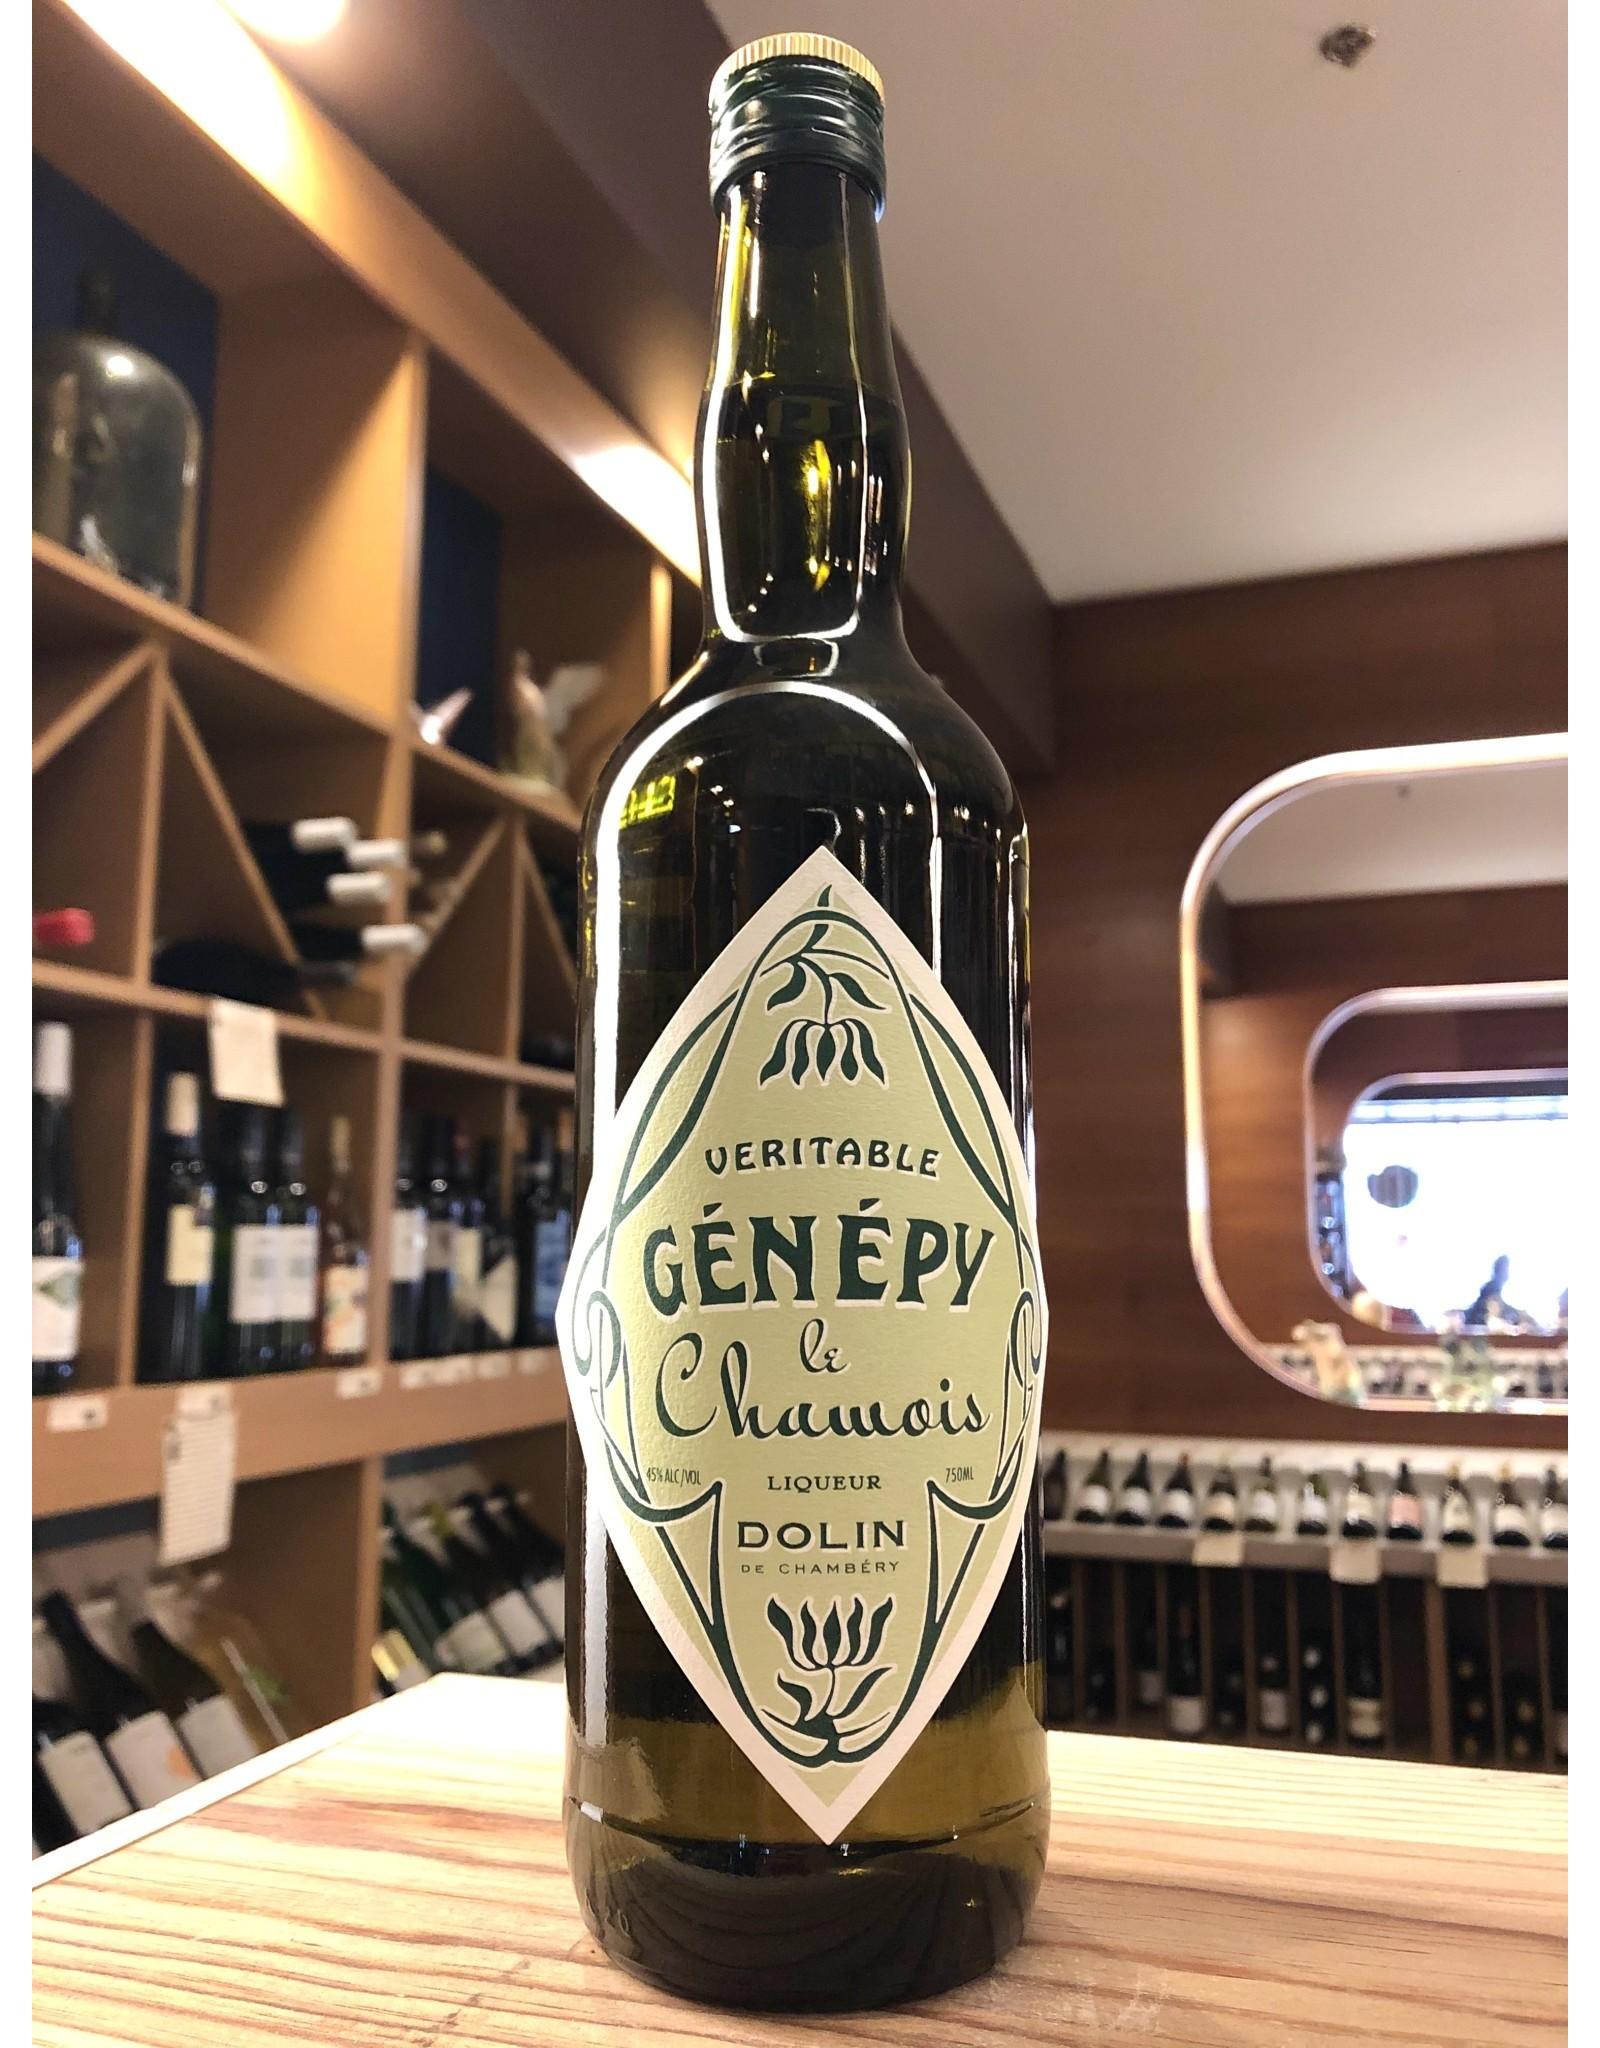 Dolin Genepy des Alpes - 750 ML